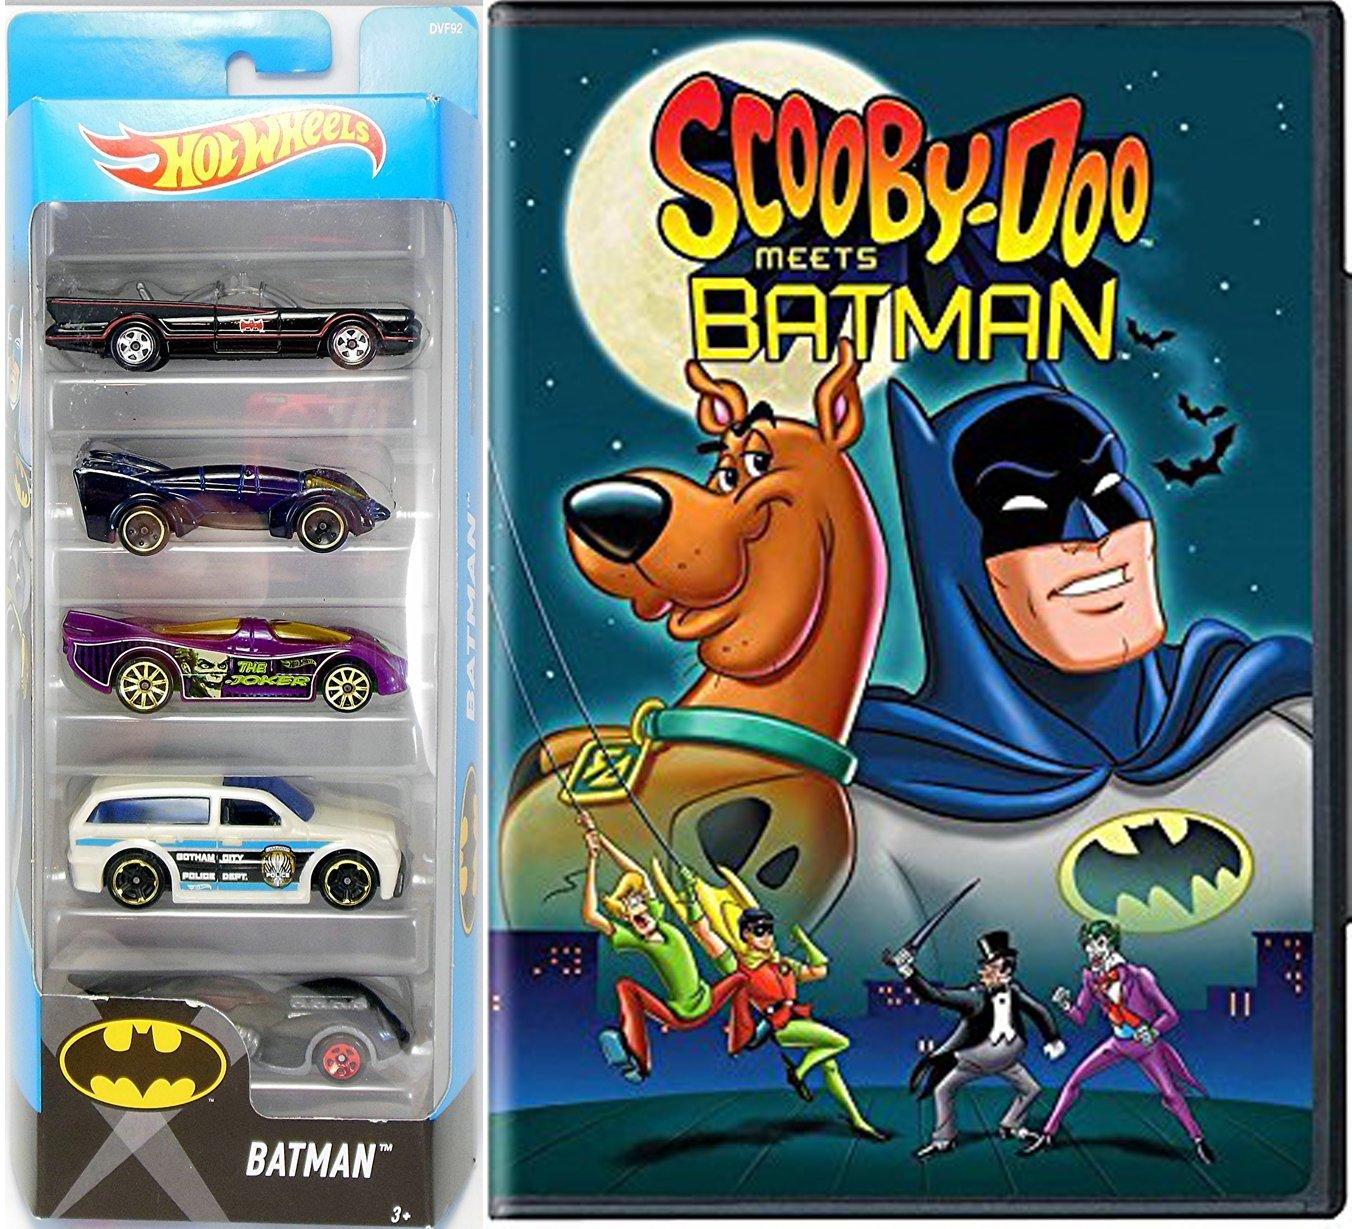 Scooby-Doo Meets Batman Cartoon DVD car set & Hot Wheels 5 car City Pack Batmobile Classic TV series / Gotham City Police Car / The Joker / Live / Arkham Asylum